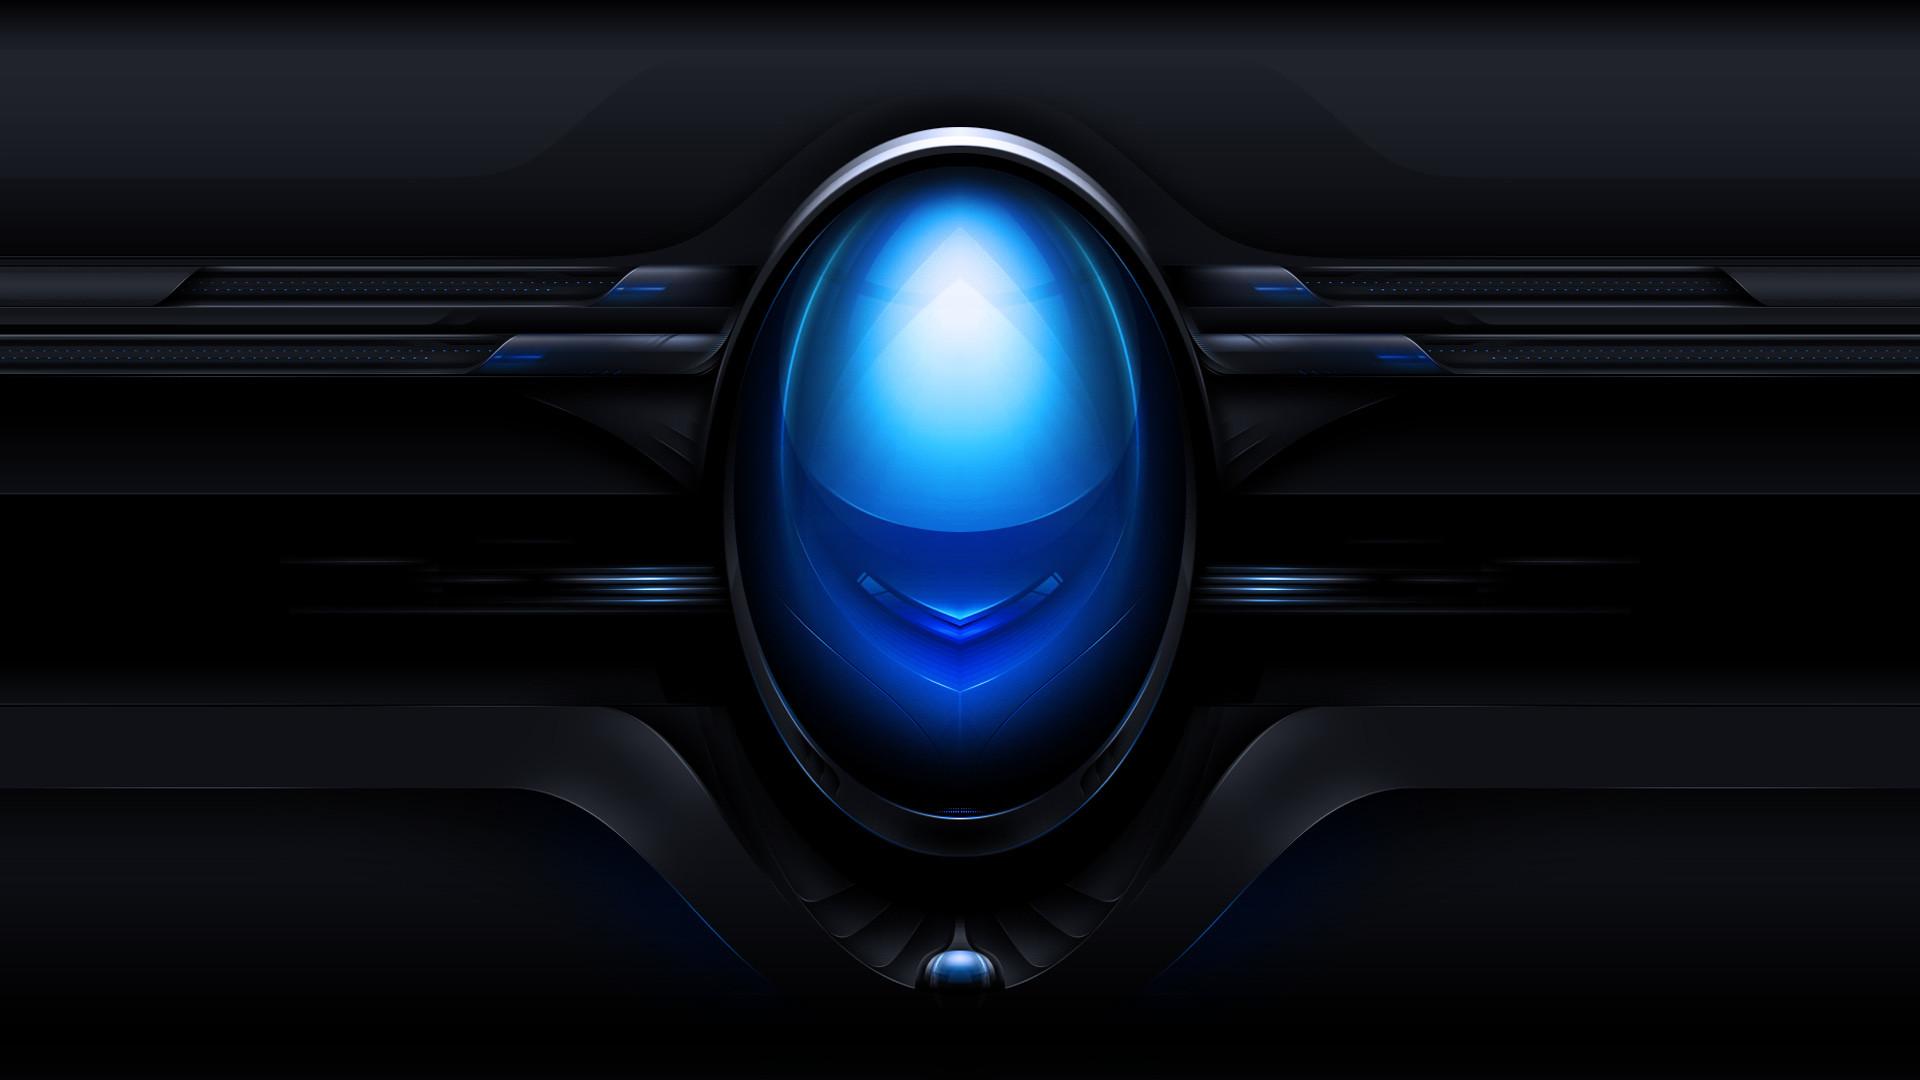 Black And Blue Tech Wallpaper: Alienware Wallpaper 1920x1080 HD (80+ Images